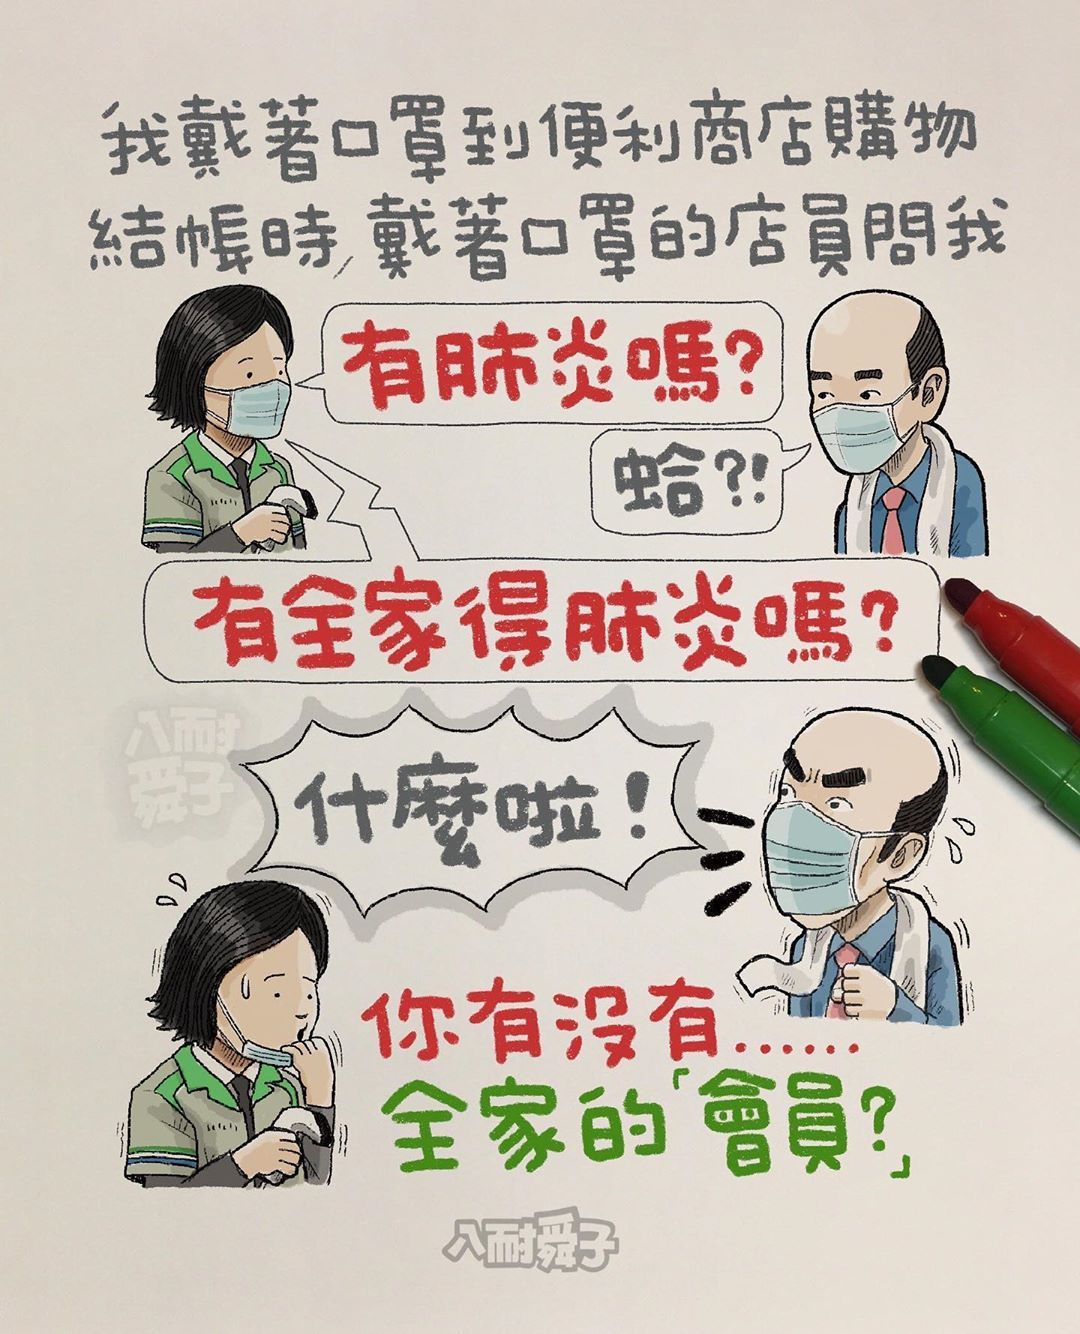 19.7K 個讚。144 則留言 - Instagram 上的 八耐舜子(@banai_design):「 有肺炎嗎?? 網路笑話手抄/Julia Chang 提供 ...